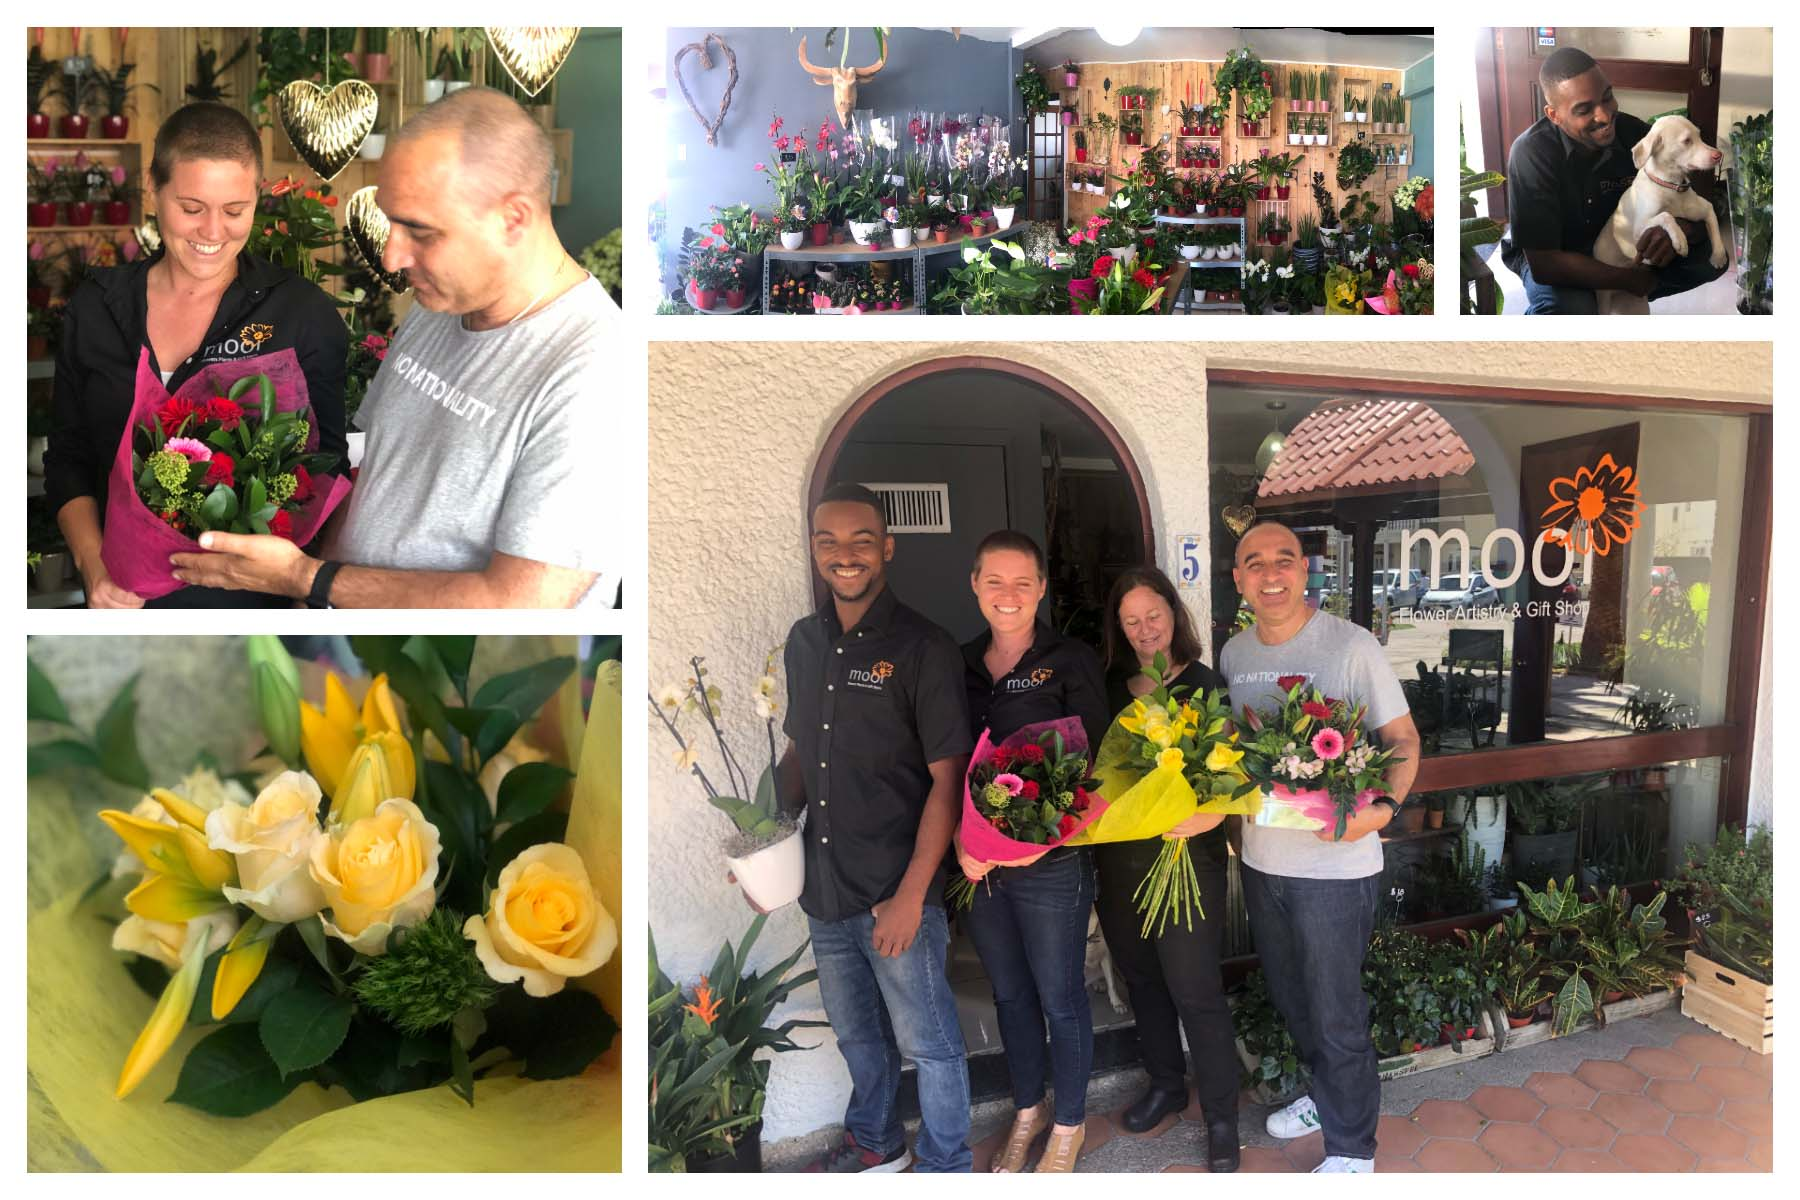 Mooi Flowers, Plants & Giftstore